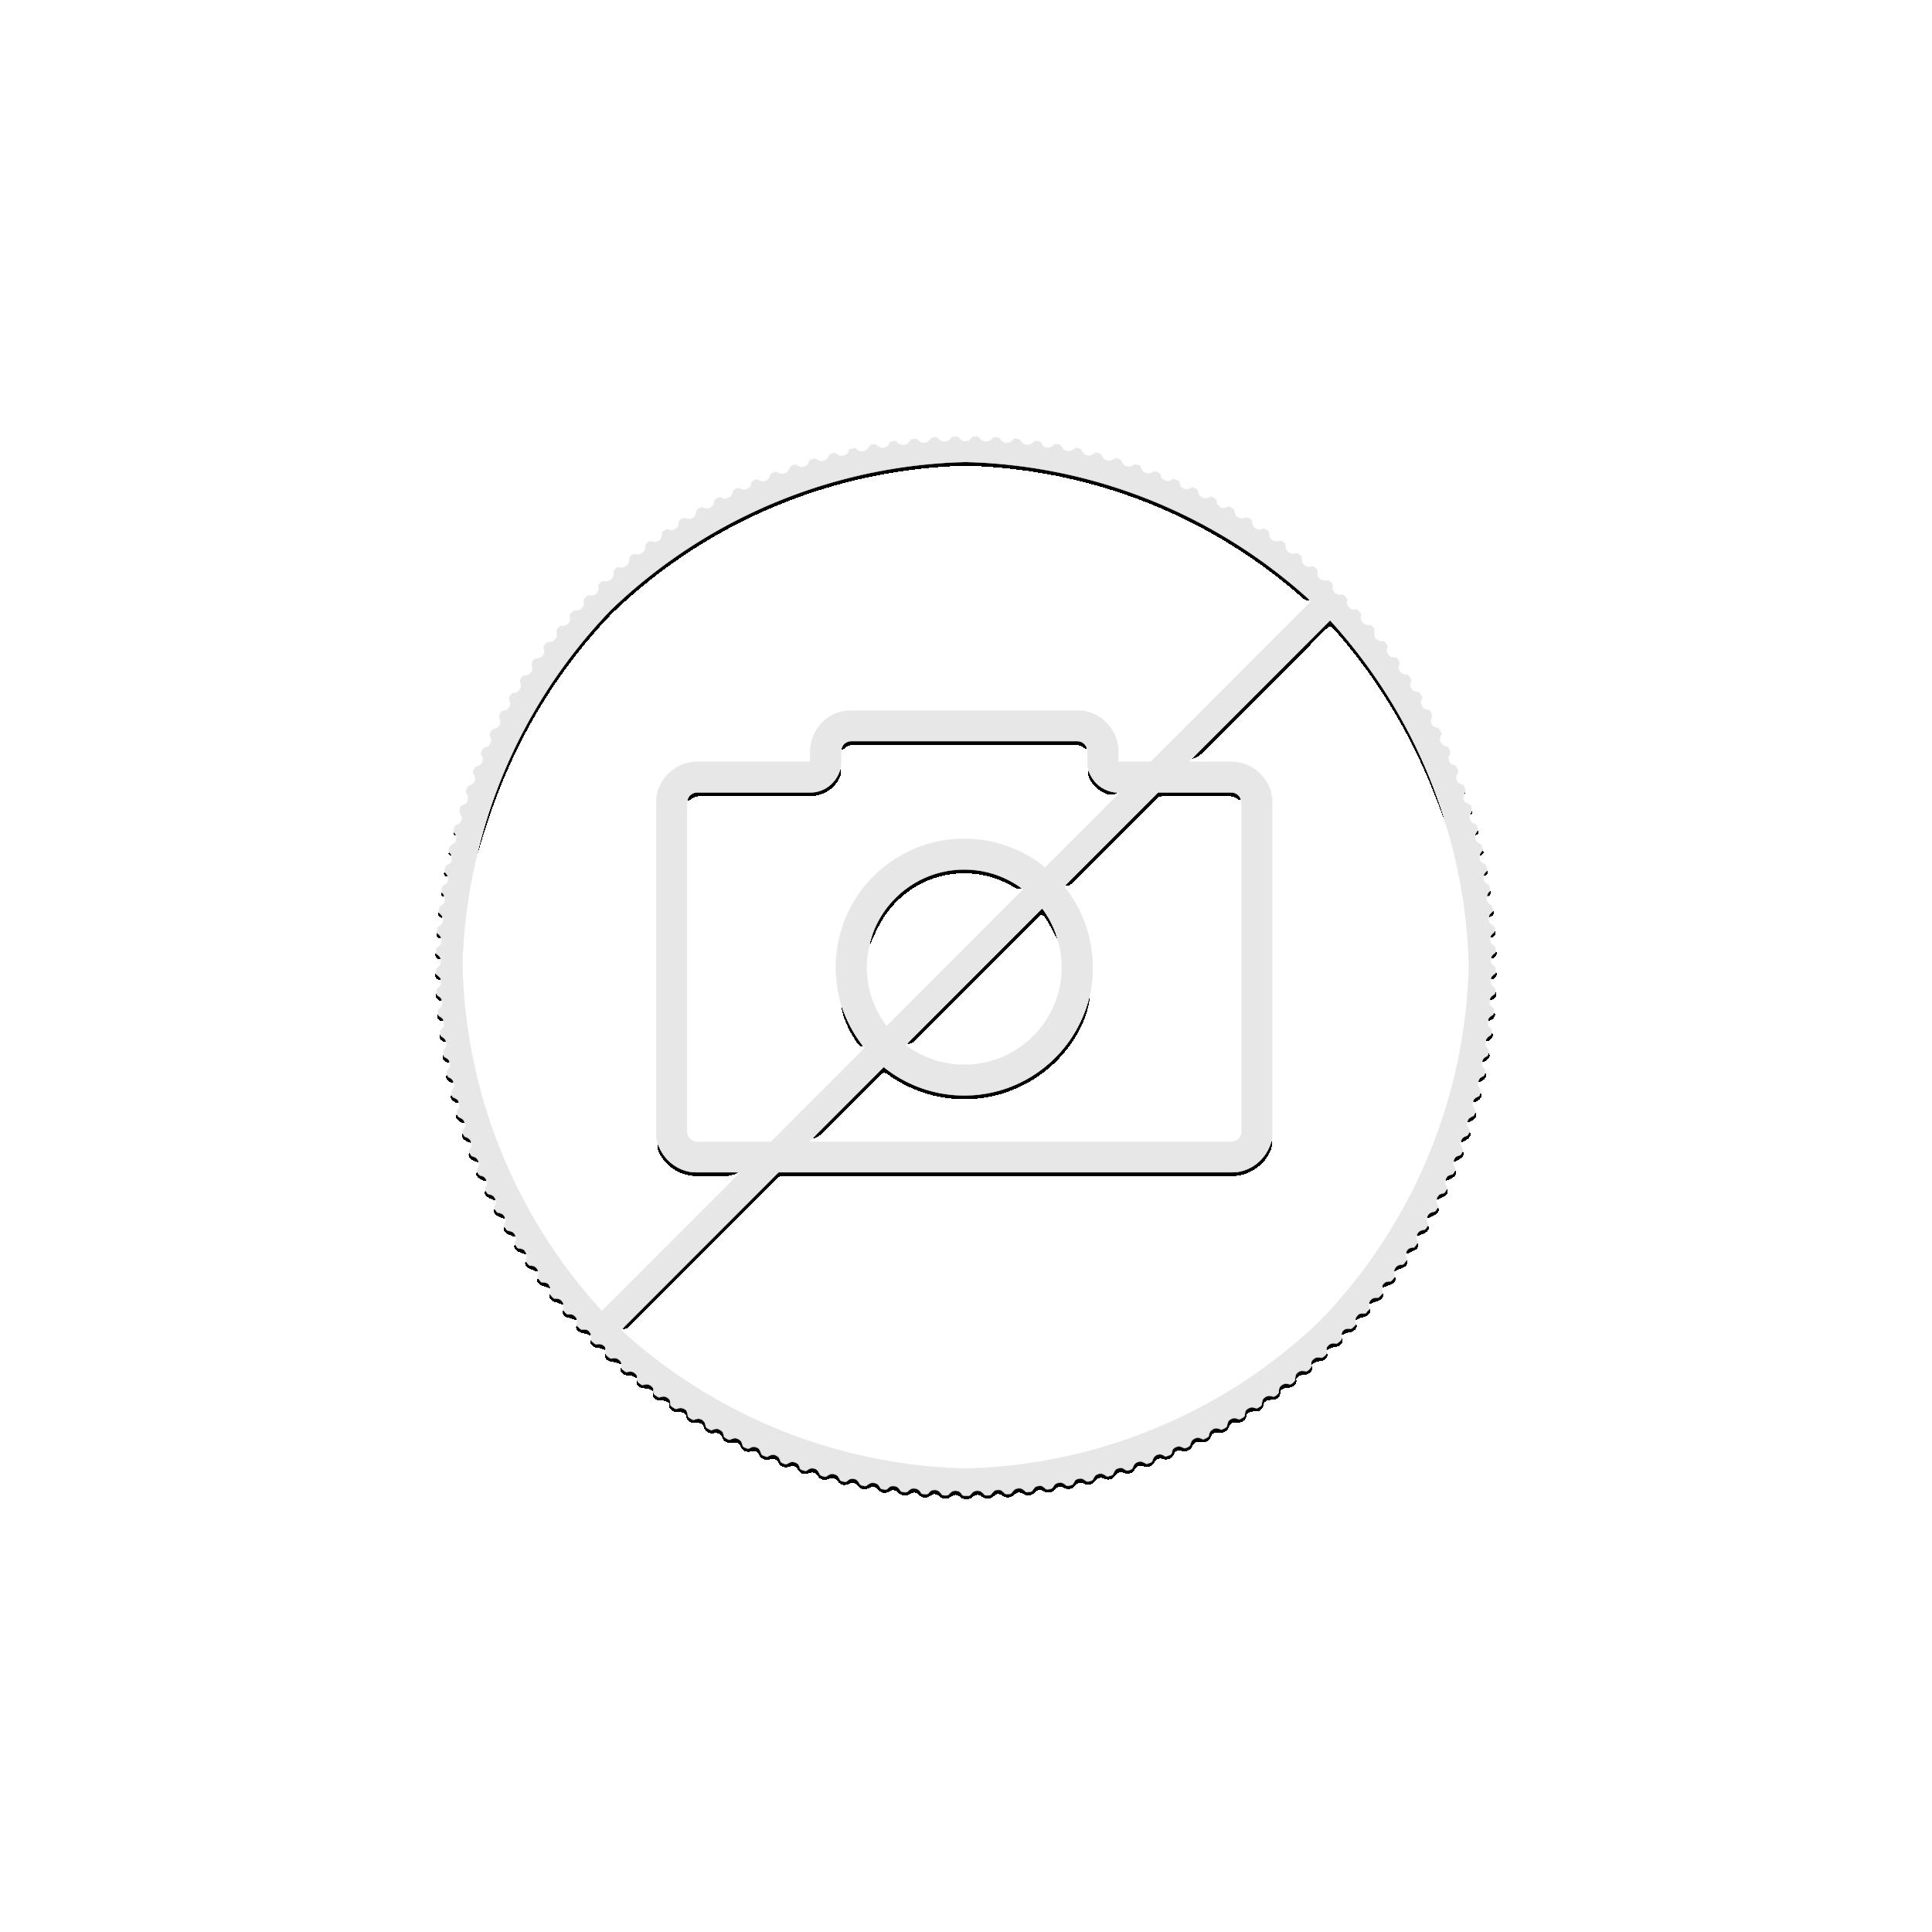 1 Troy ounce zilveren munt Silver Swan 2019 achterzijde